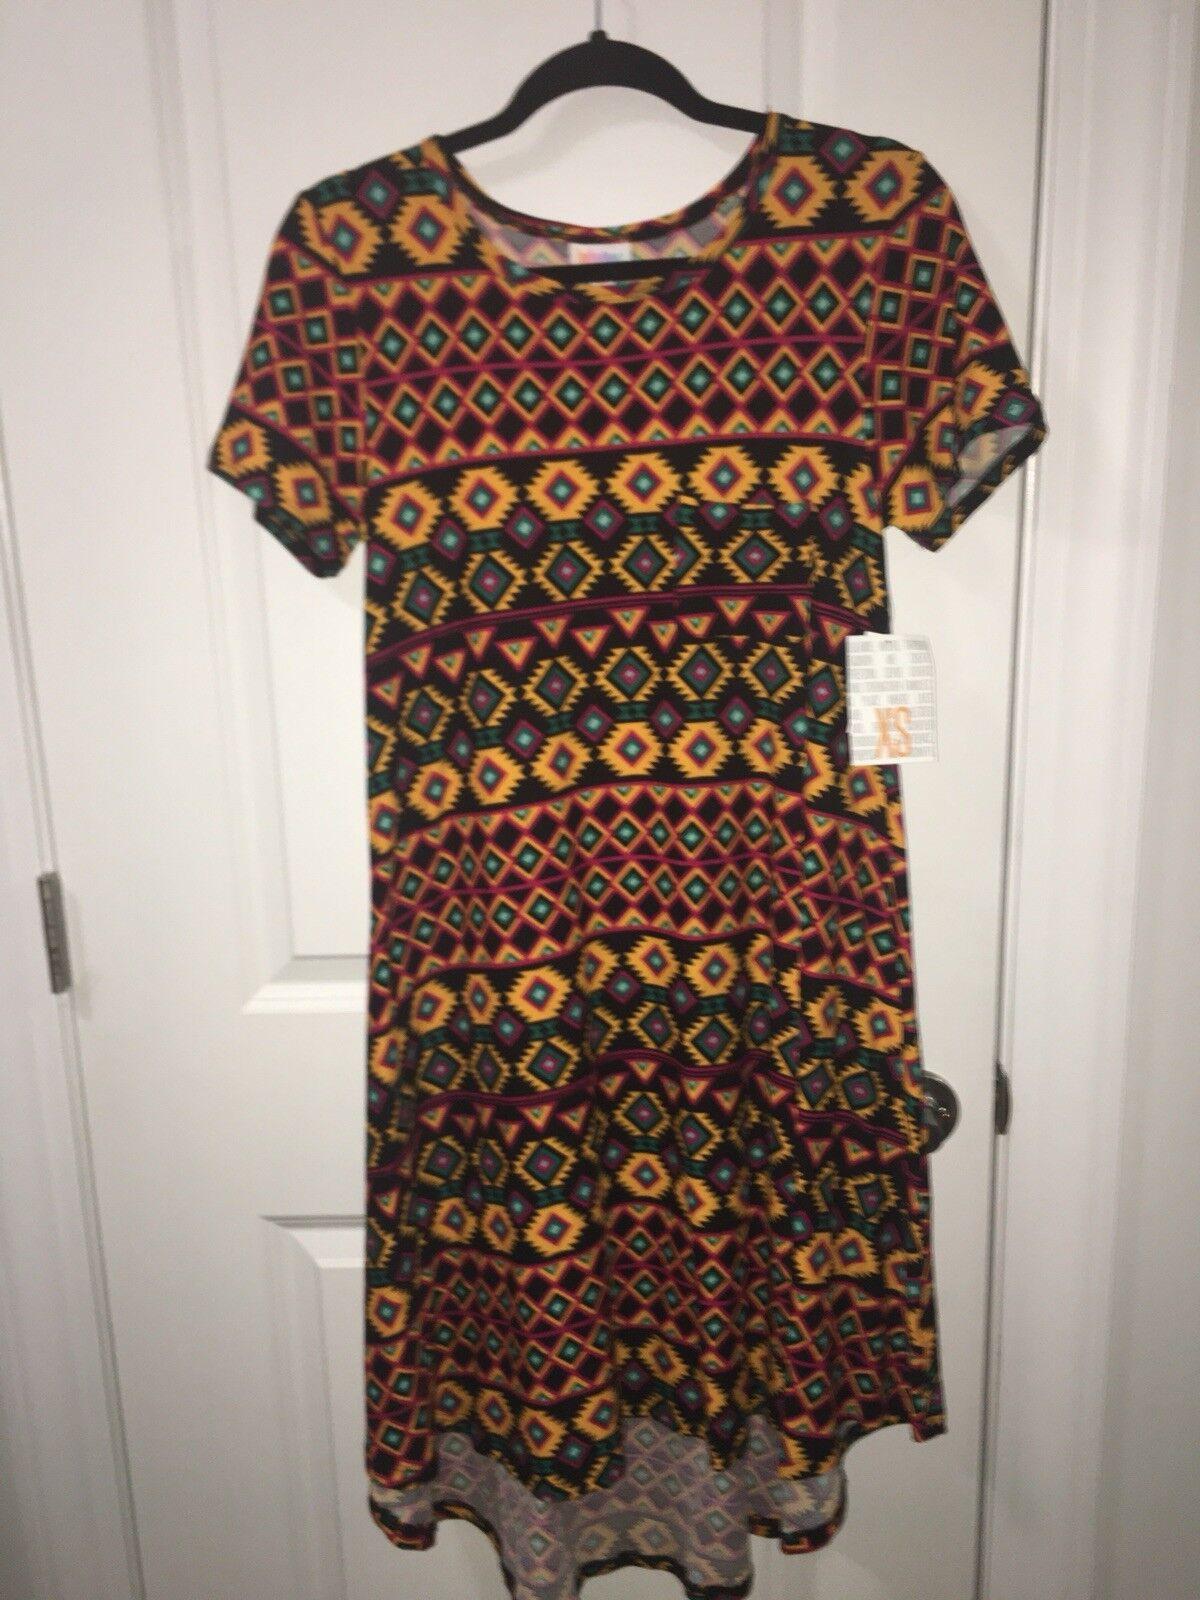 Lularoe XS Carly Dress Multicolor Aztec Leggings Material Super Soft